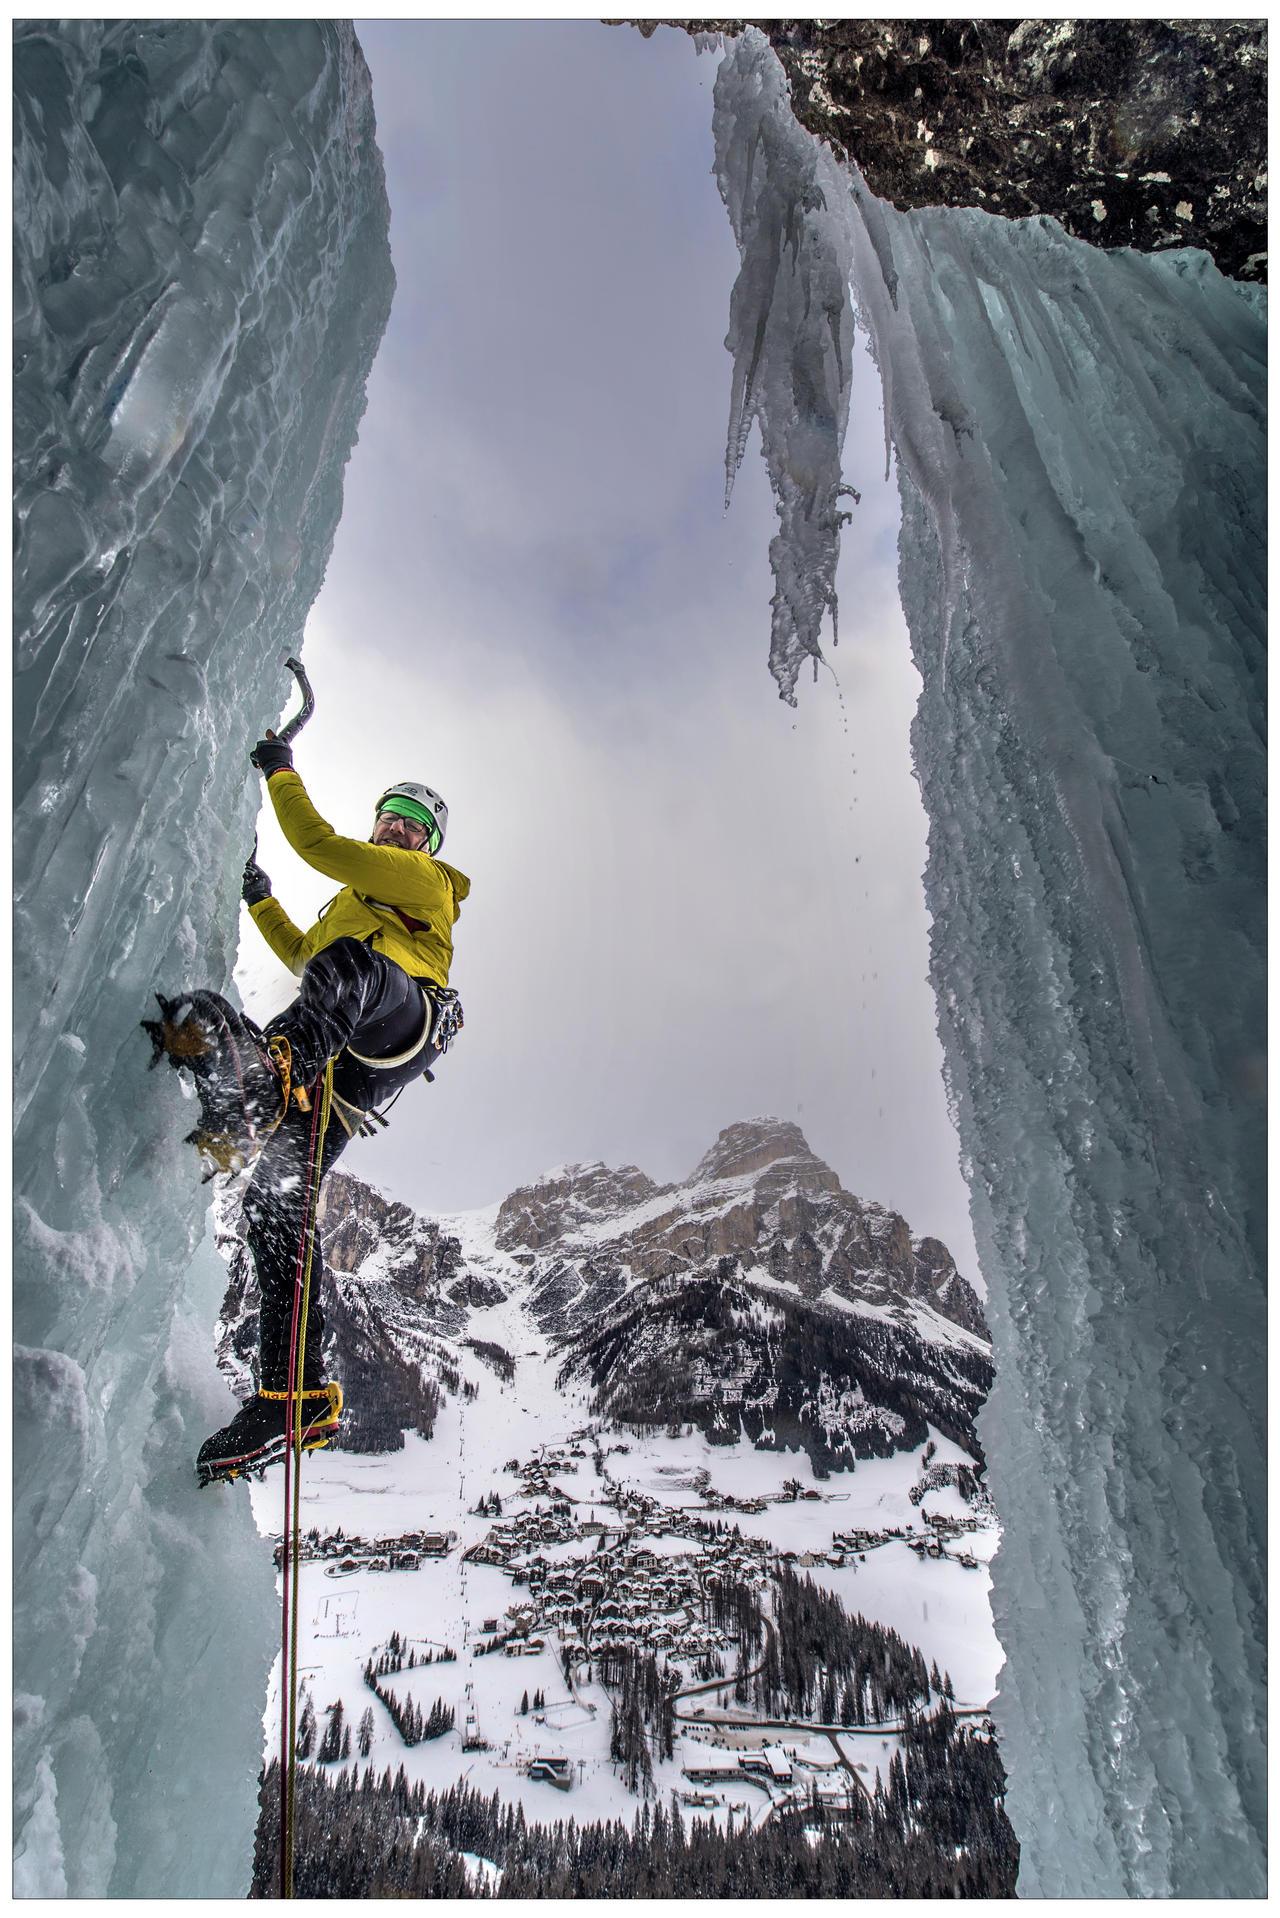 Ice climbing above Colfosco by JamesRushforth on DeviantArt